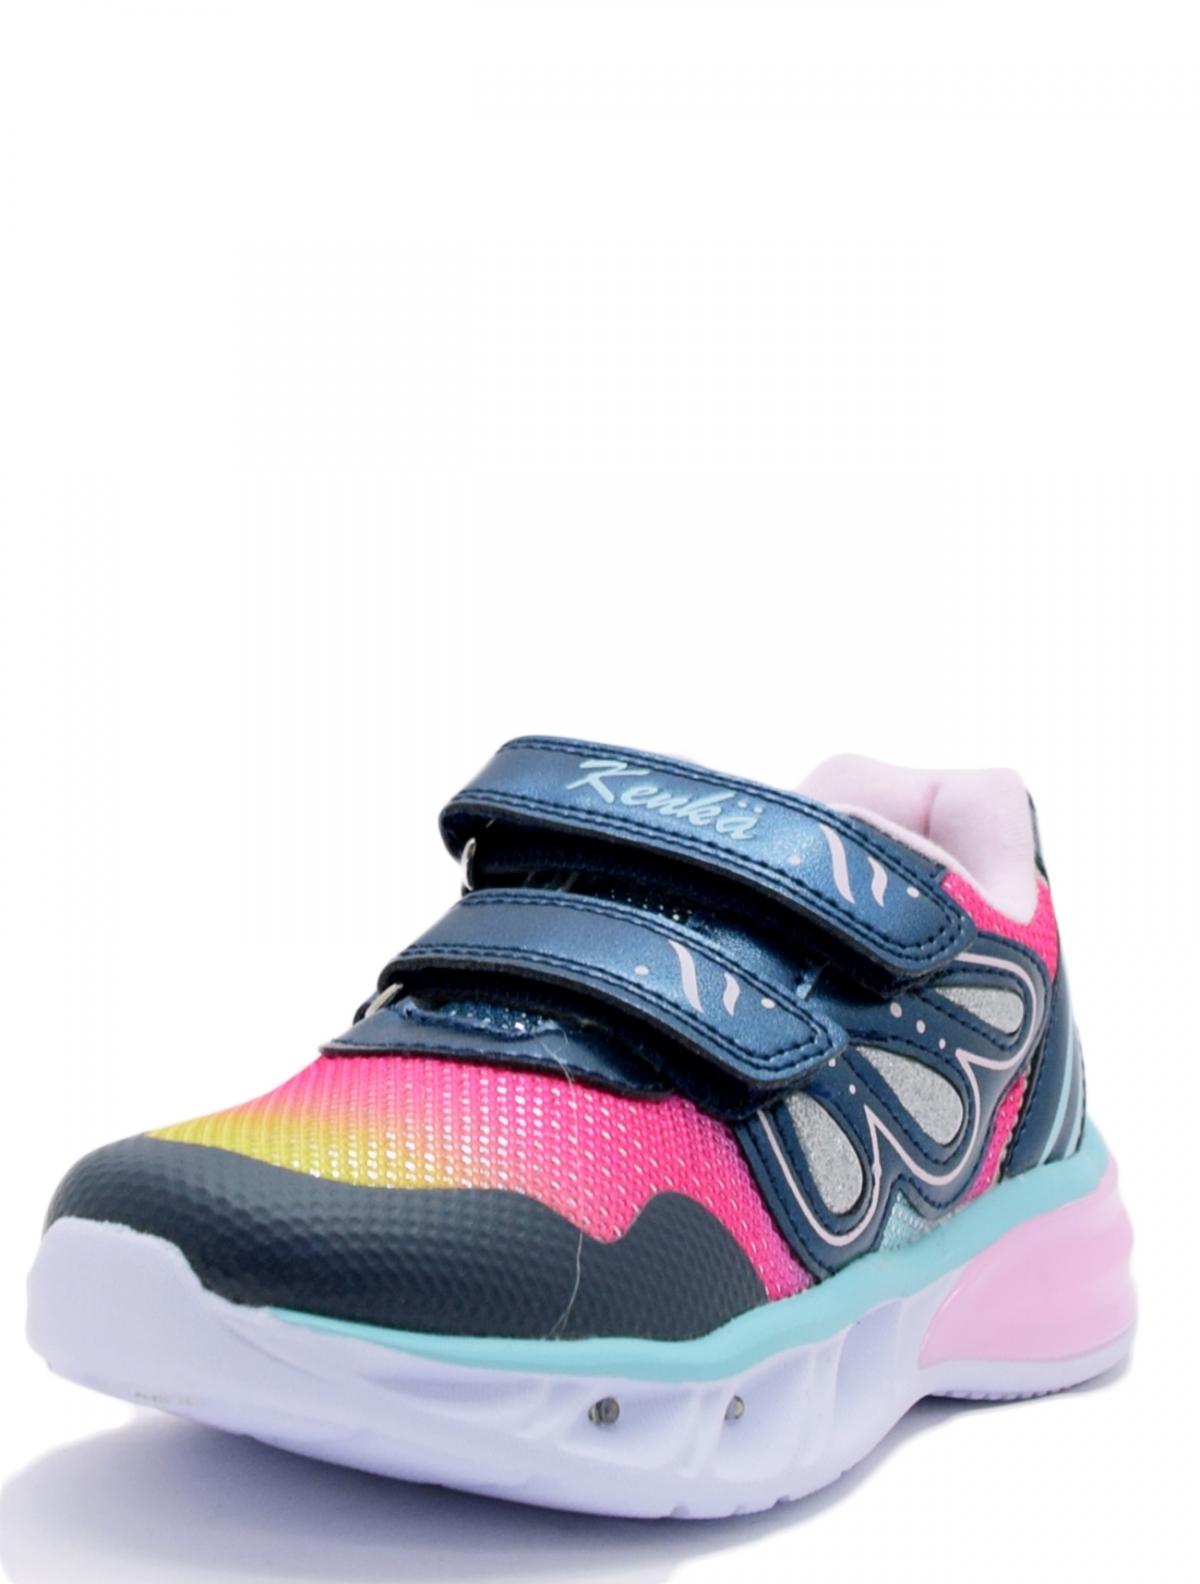 Kenka KNQ-2004 детские кроссовки